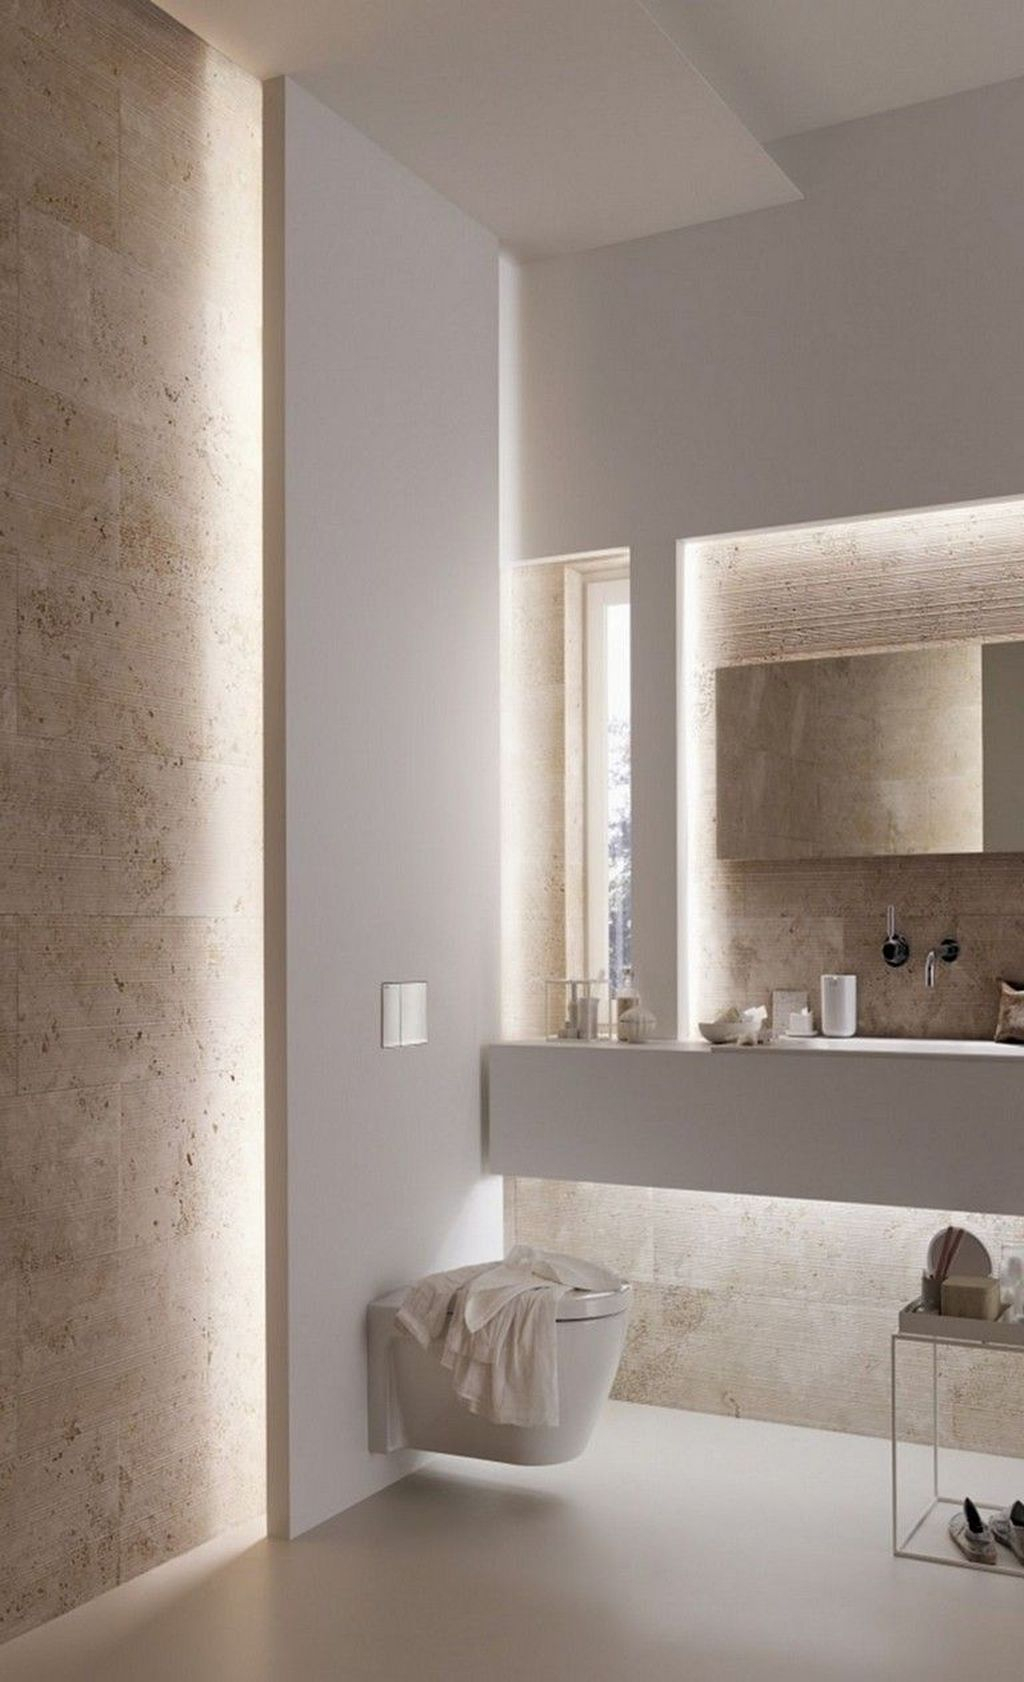 Unusual Bathroom Design Ideas You Need To Know 26